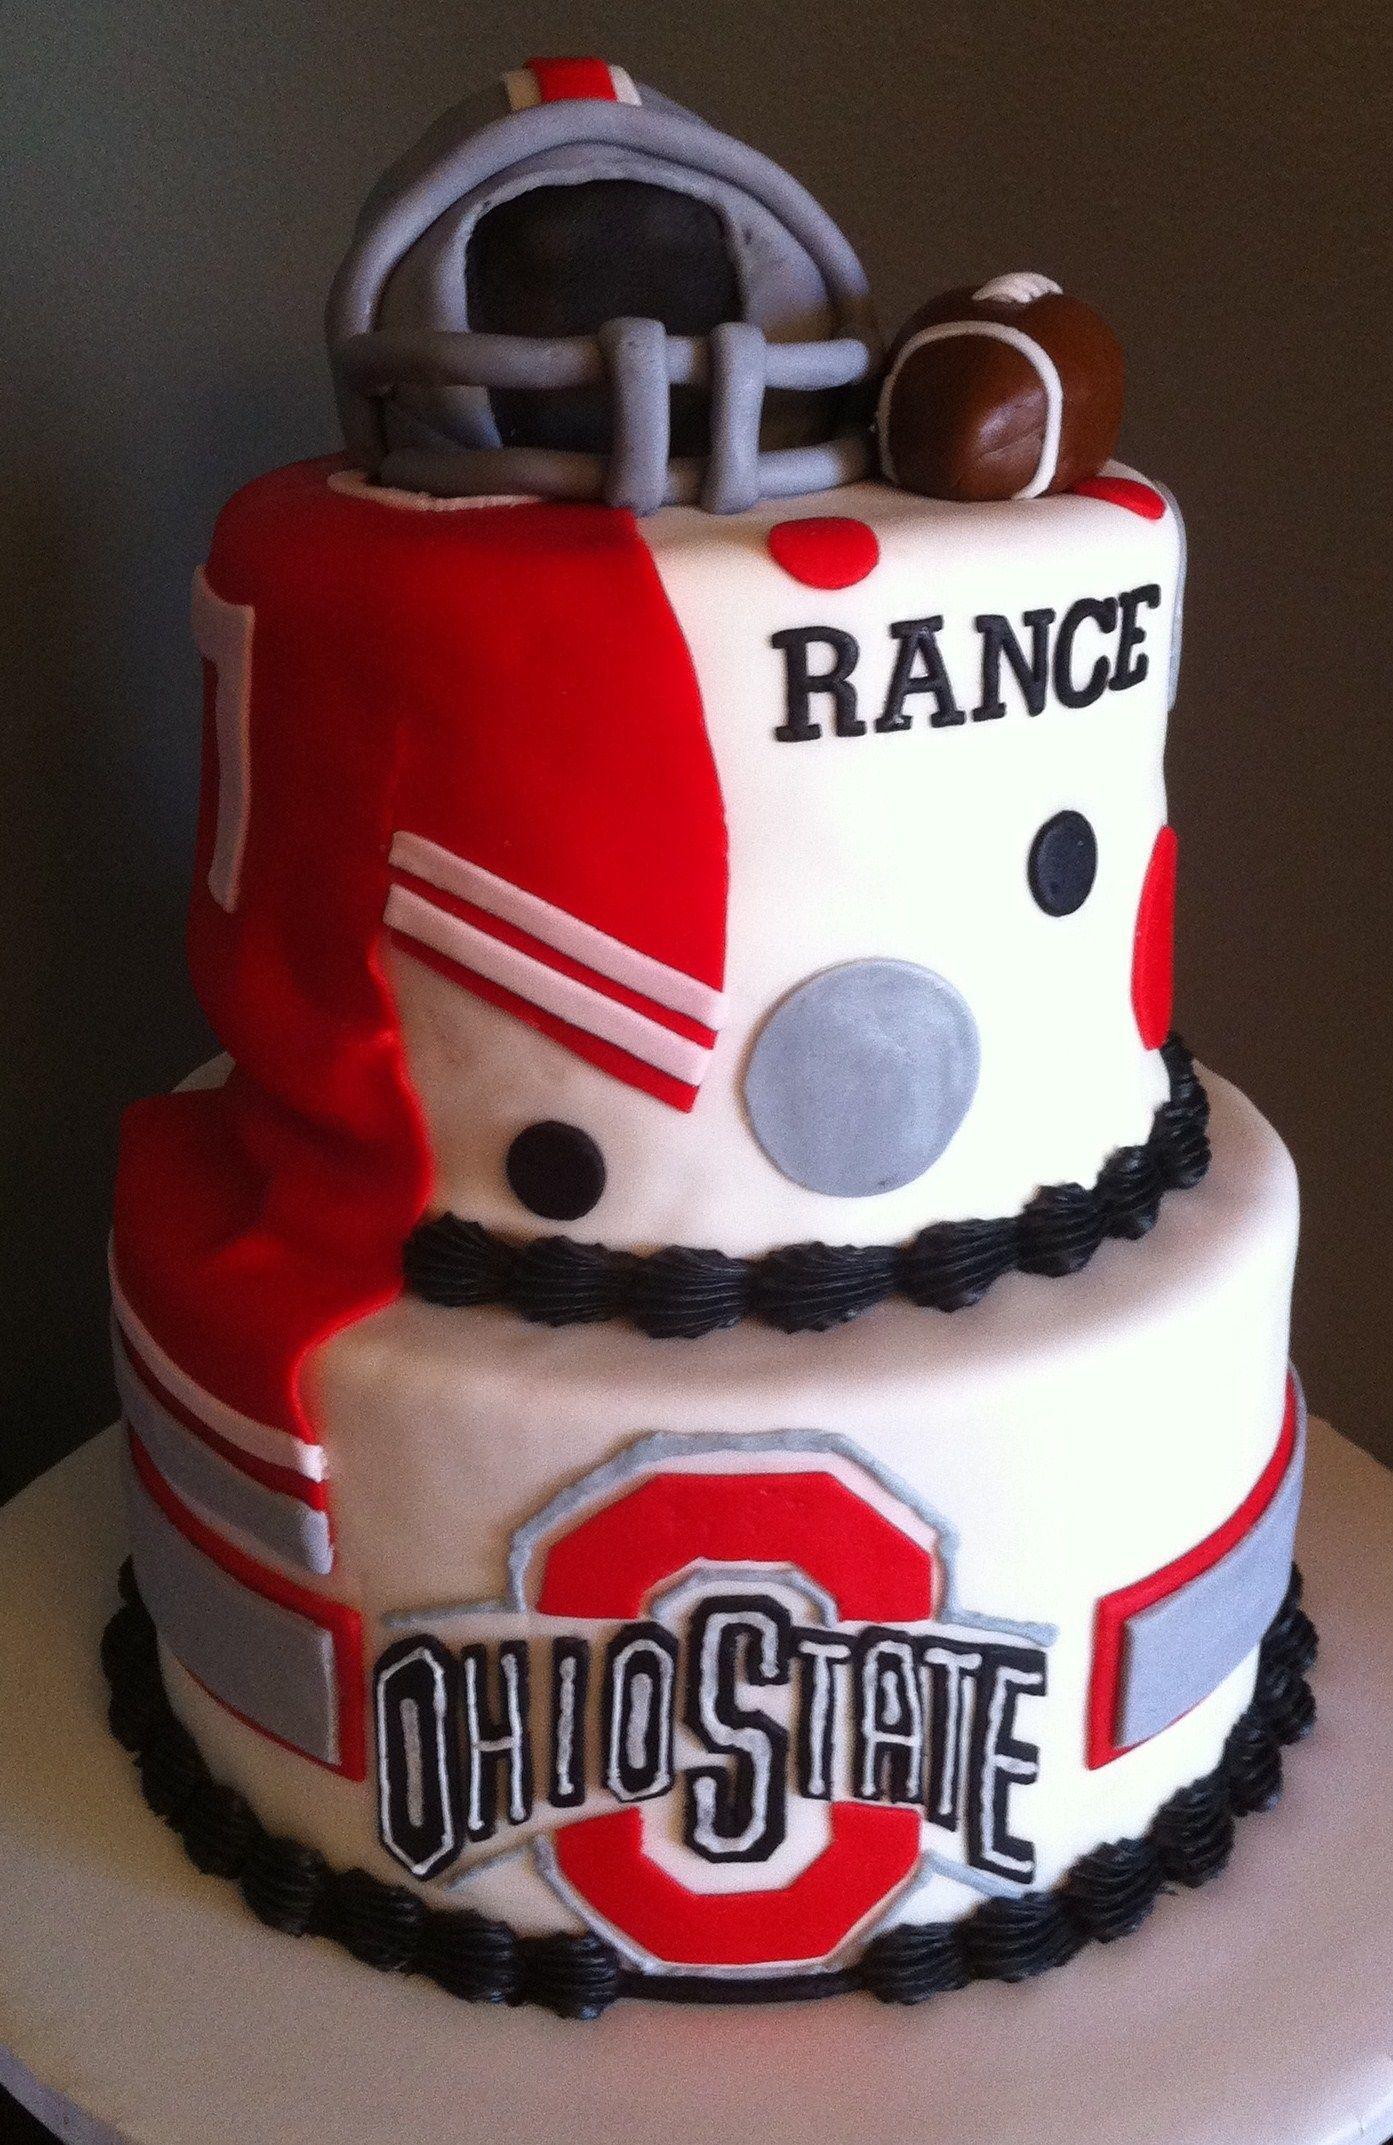 Ohio State Birthday Cake Ohio State Cake Ohio State Football